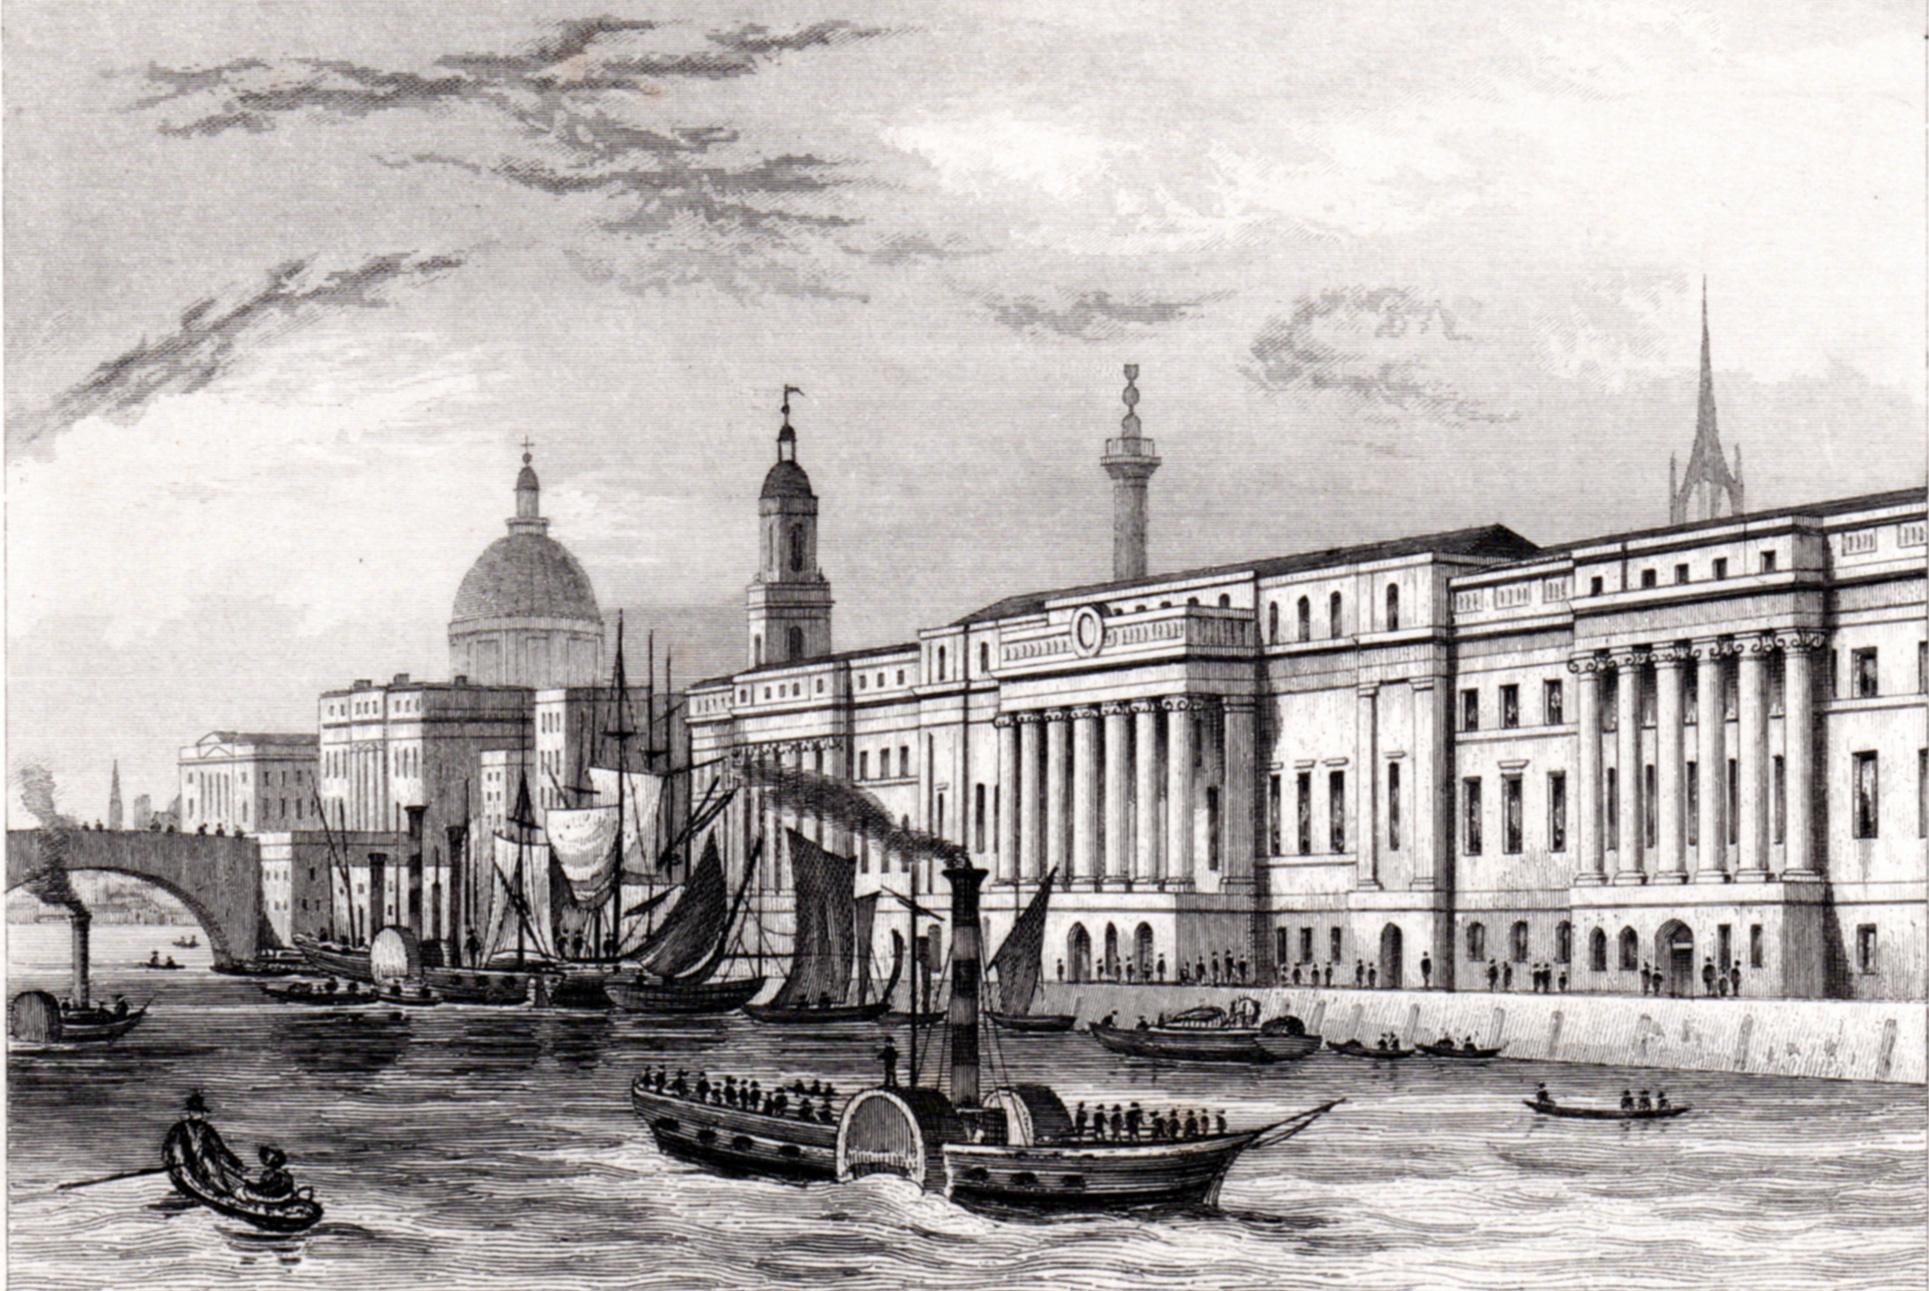 Dugdale, Thomas / Curiosities of Great Britain